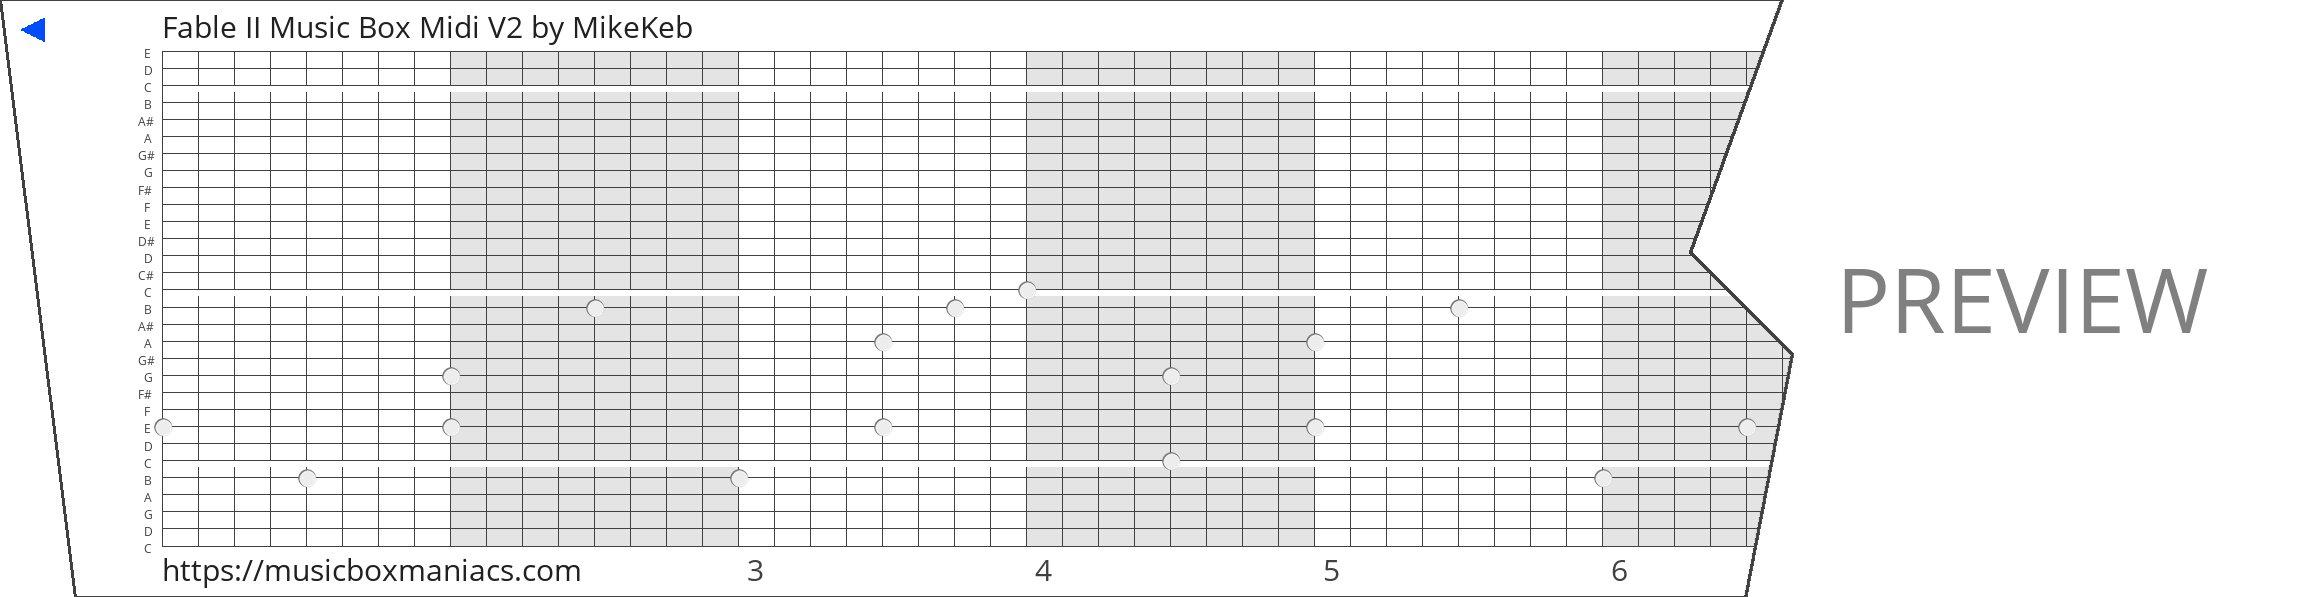 Fable II Music Box Midi V2 30 note music box paper strip